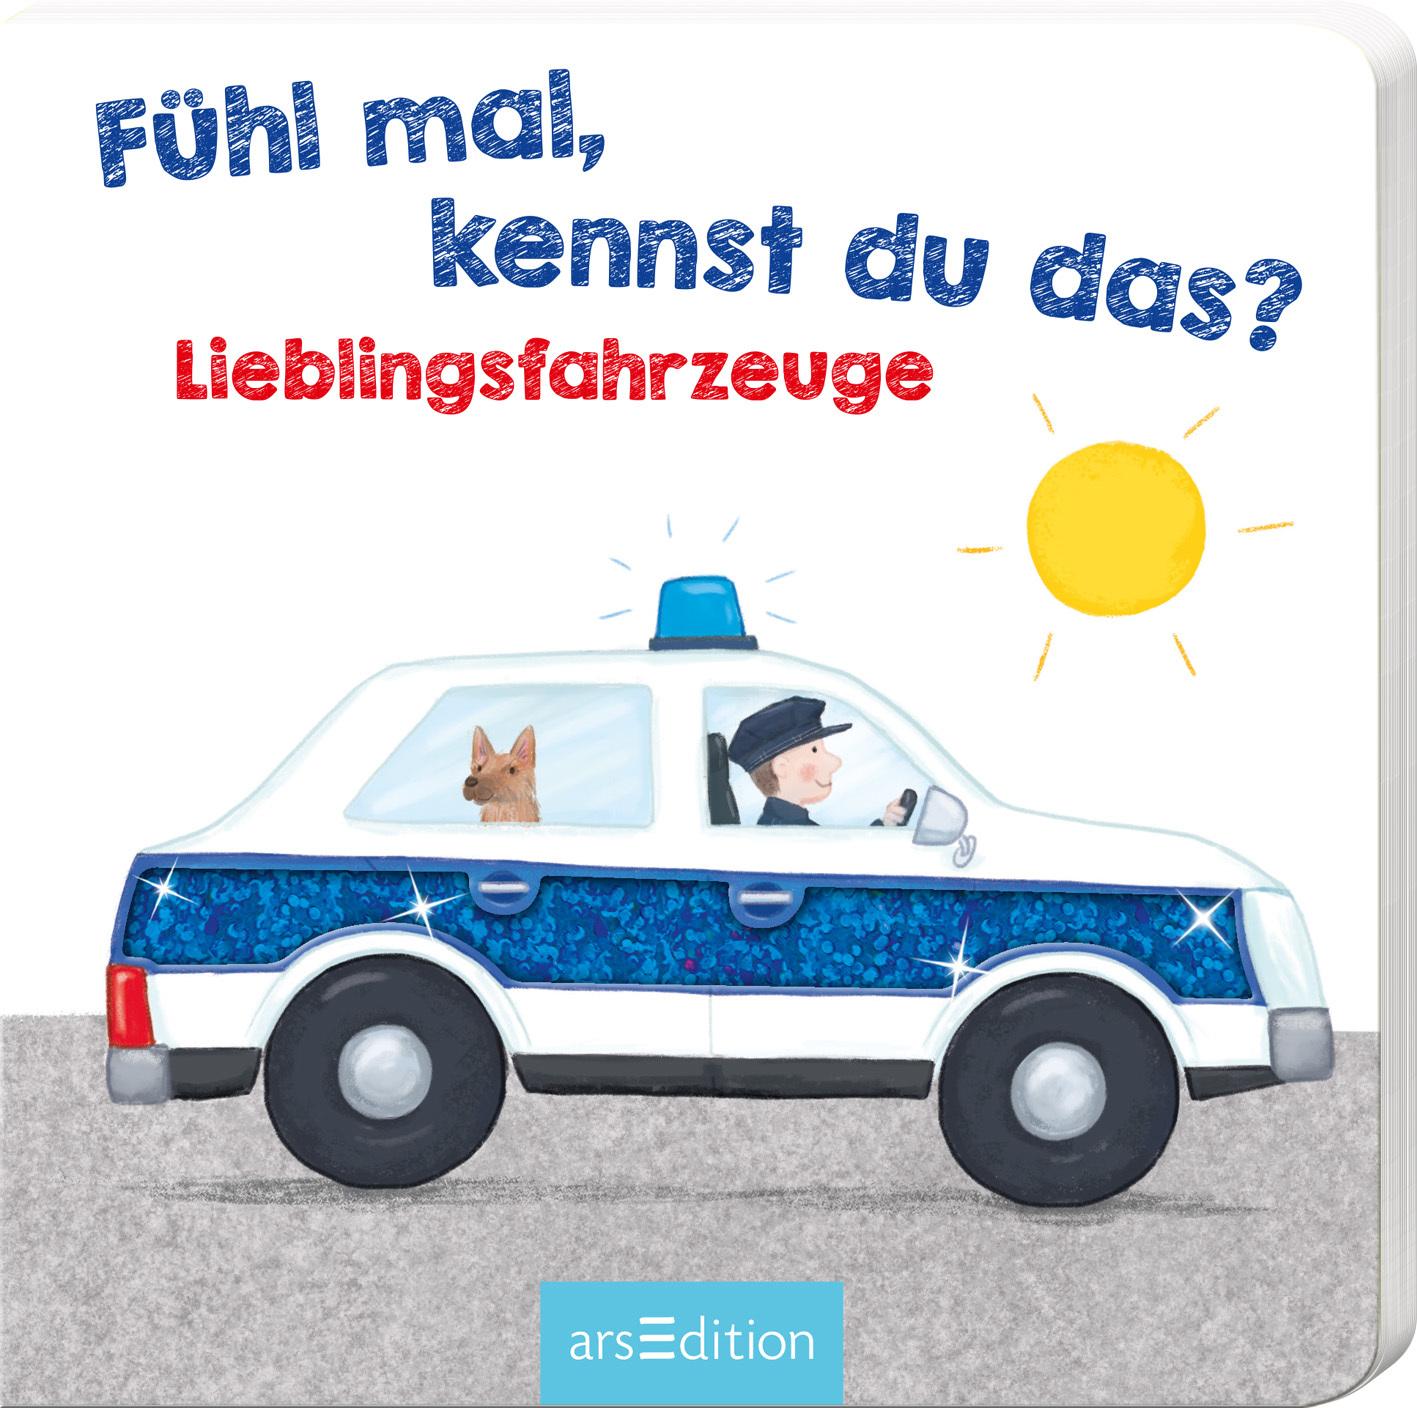 »FÜHL MAL, KENNST DU DAS? - LIEBLINGSFAHRZEUGE« — ARS EDITION